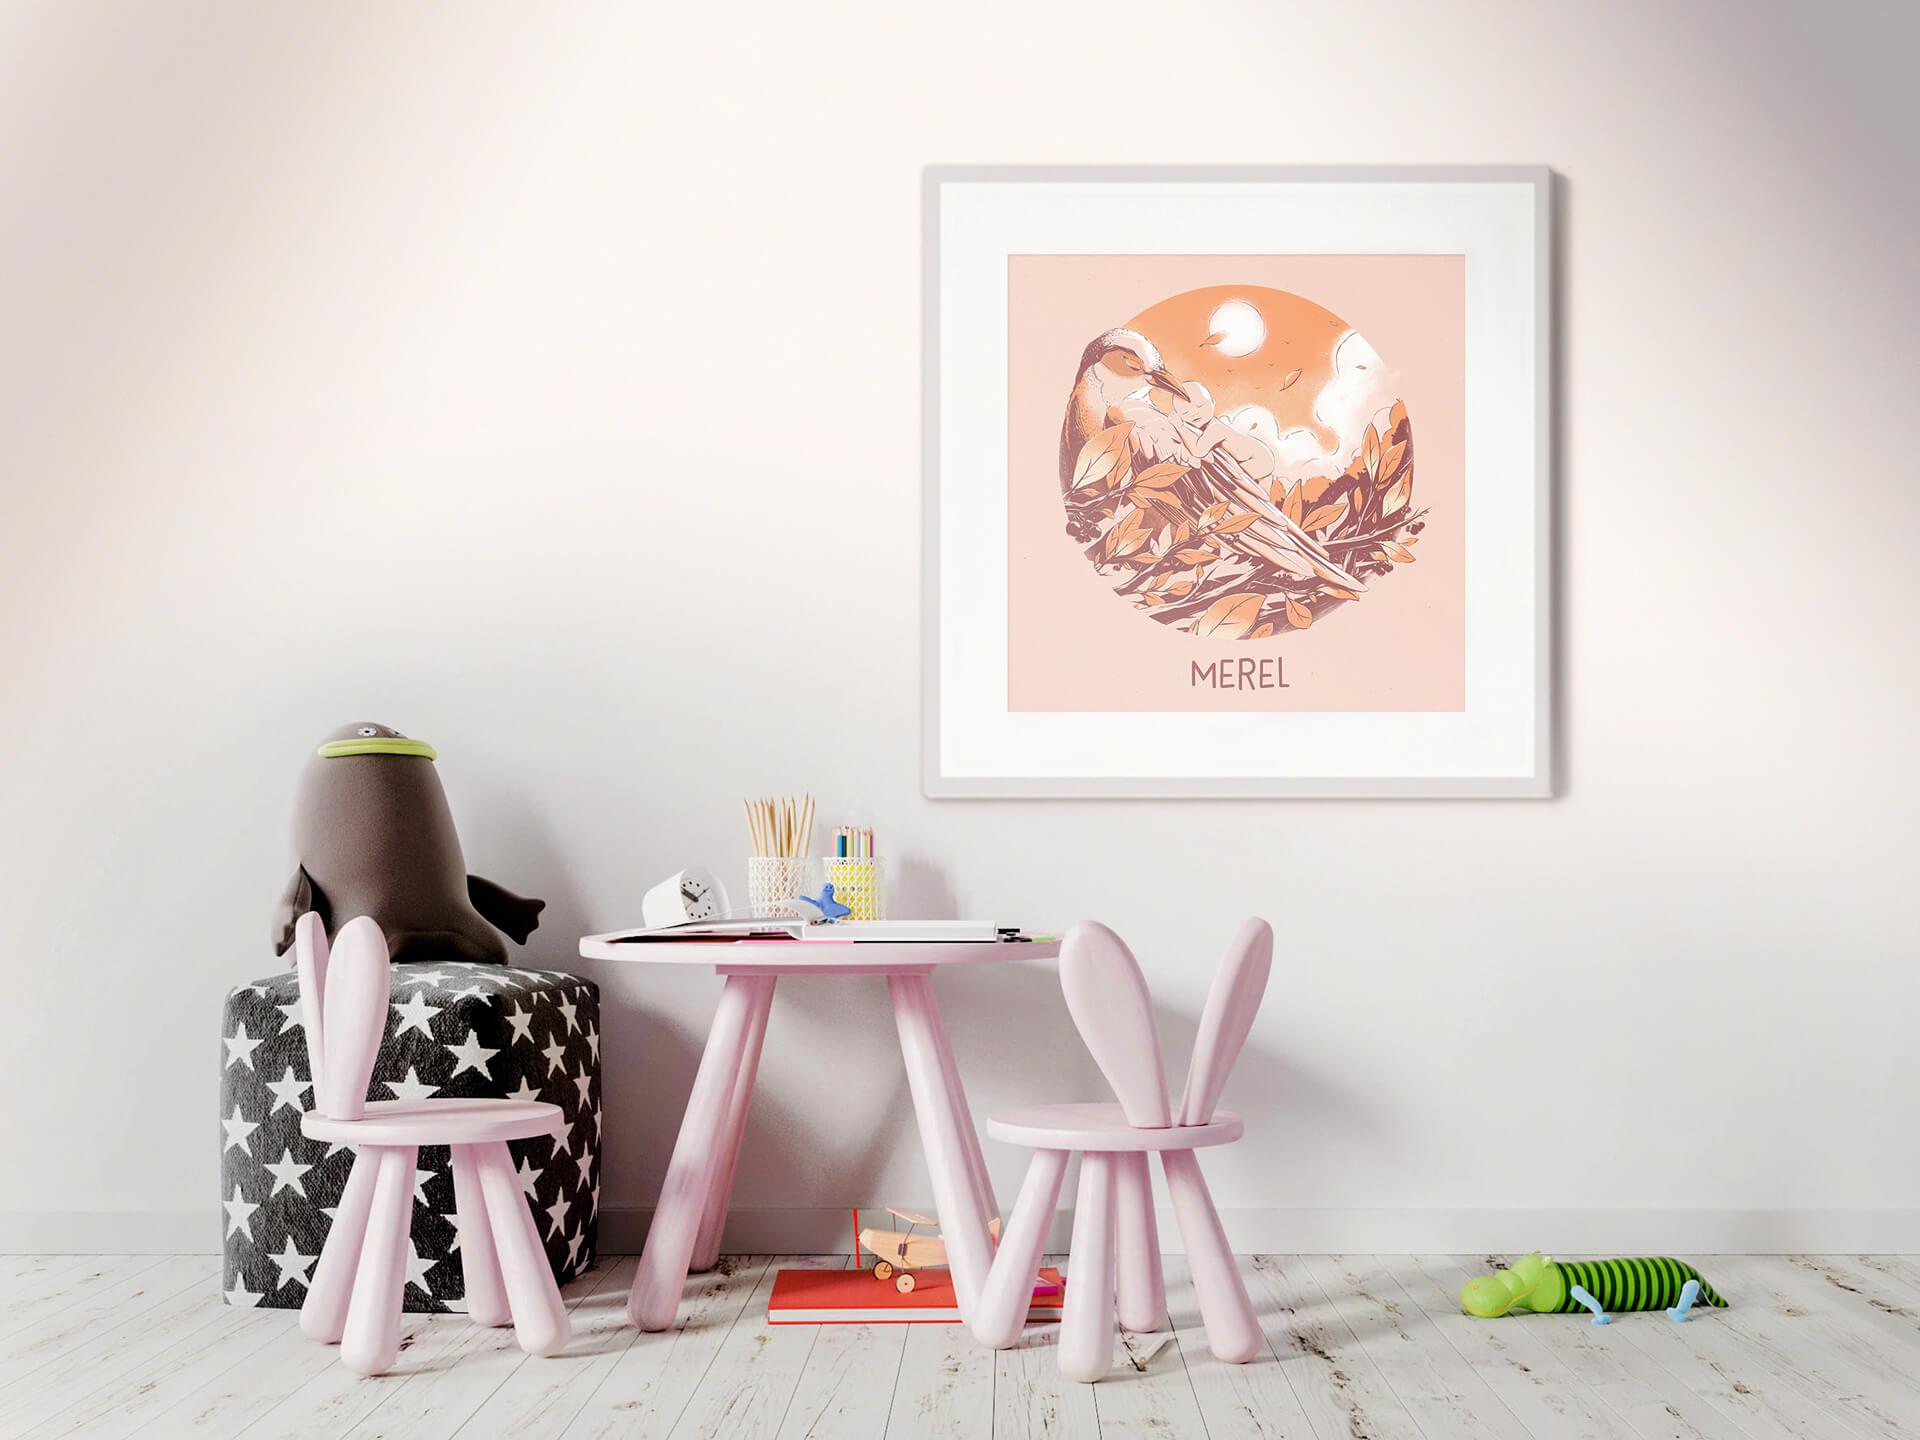 Merel Birth announcement poster